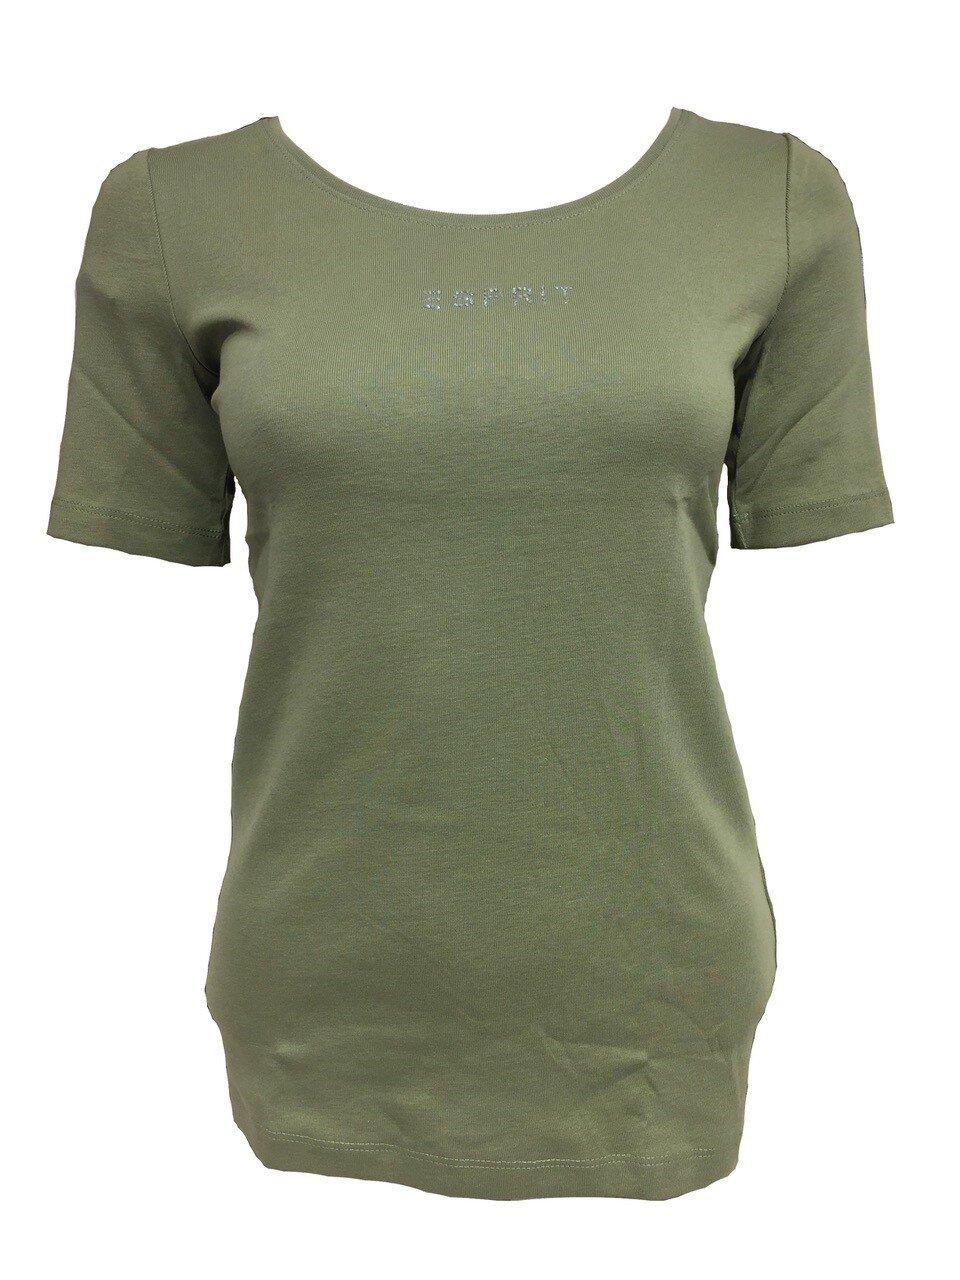 T-shirt Med Strasslogga - Lt Khaki